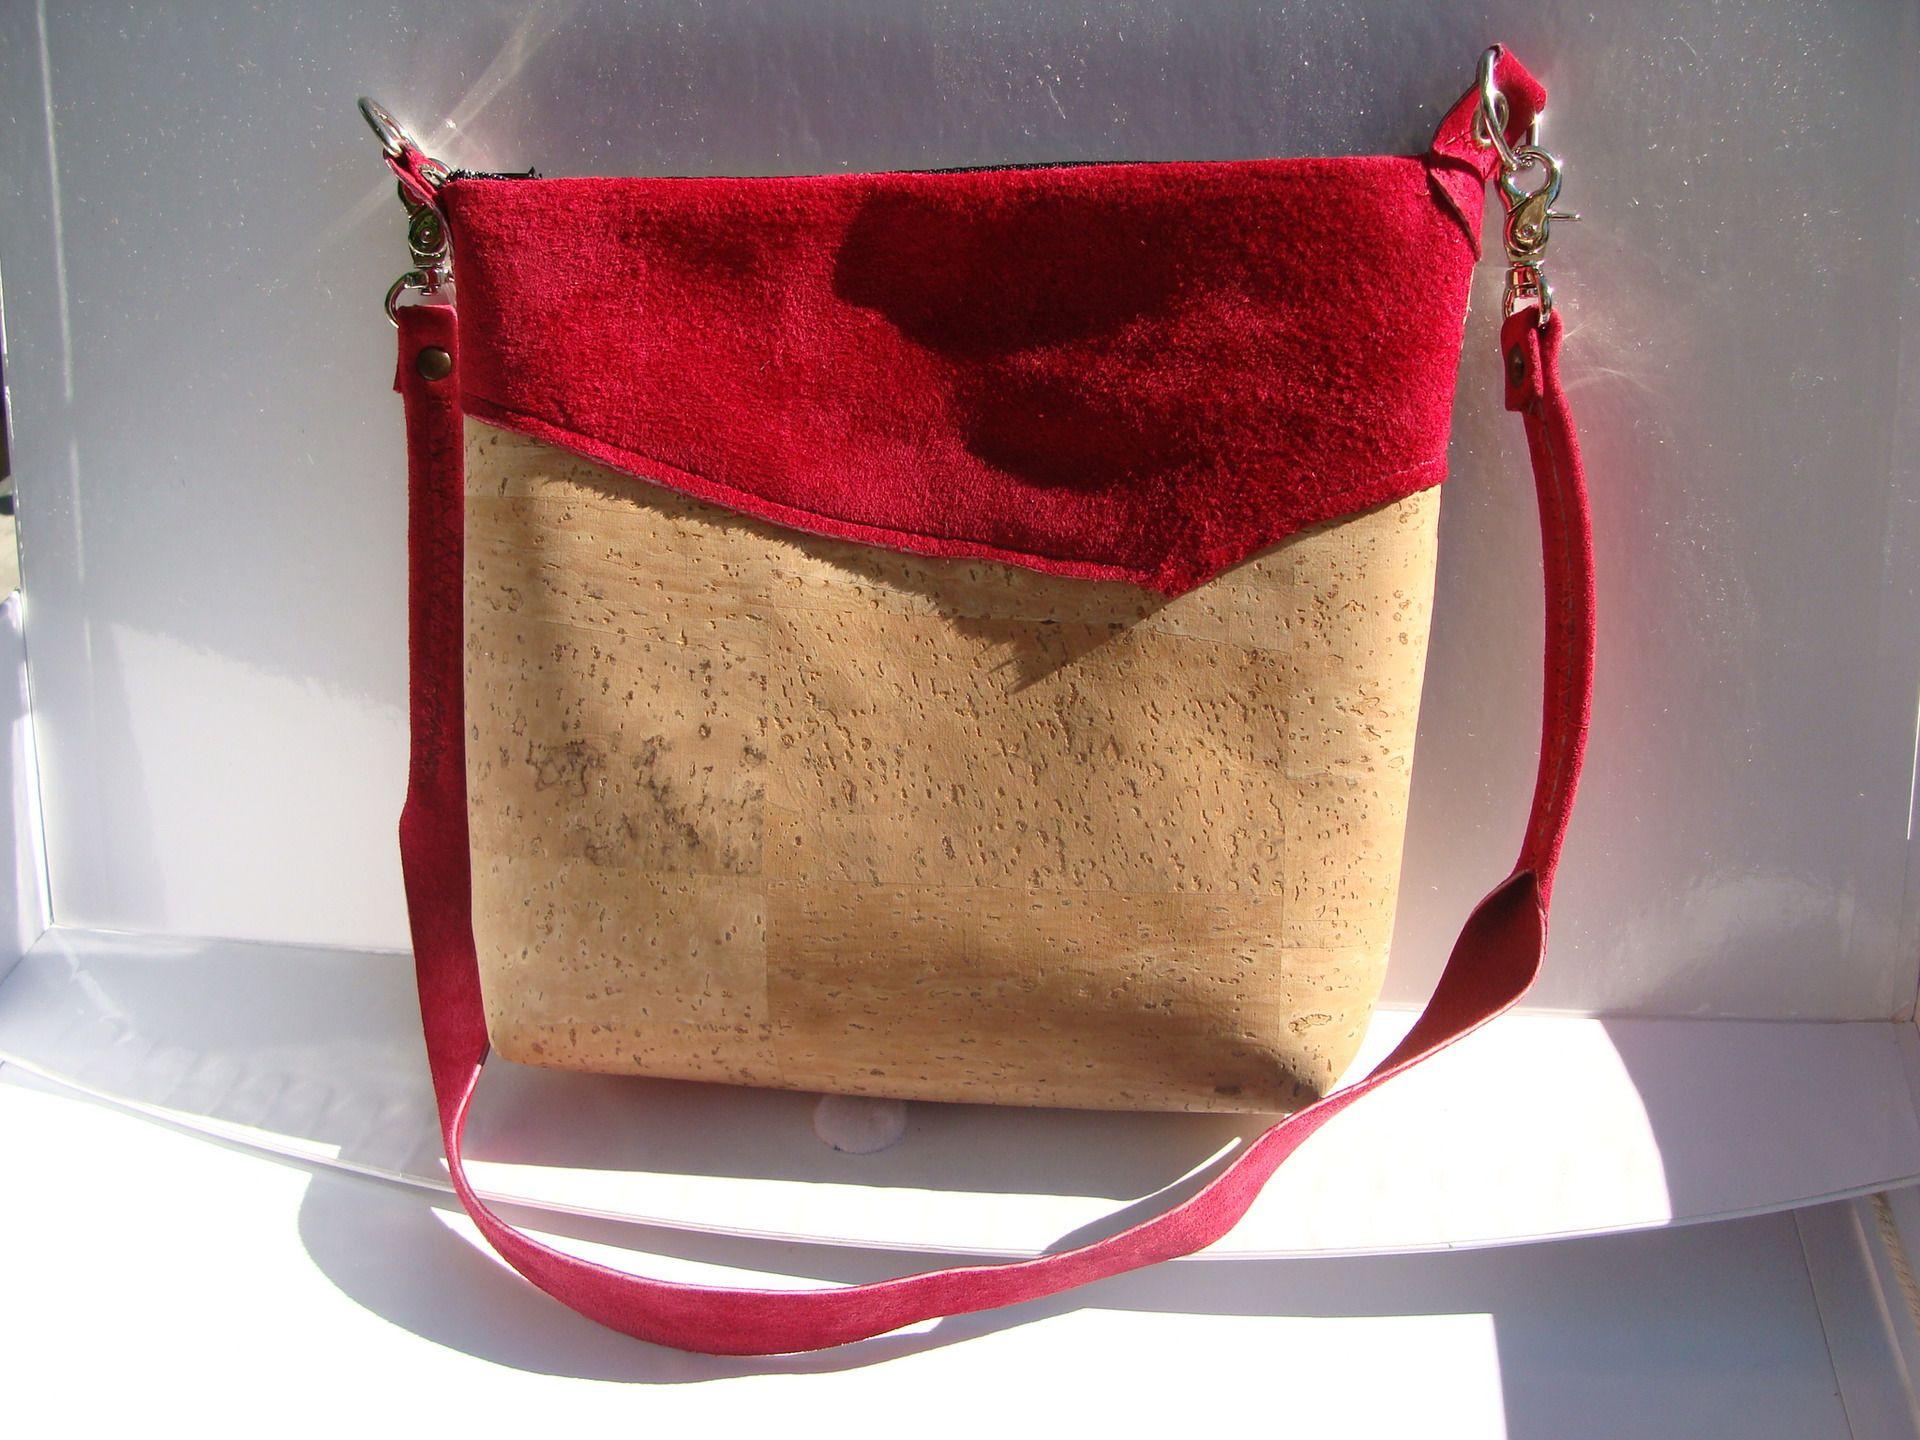 ecf87a6fa9 sac artisanal, pochette bandouliere en matiere naturel, liege et cuir  fushia : Sacs à main par nintai-art